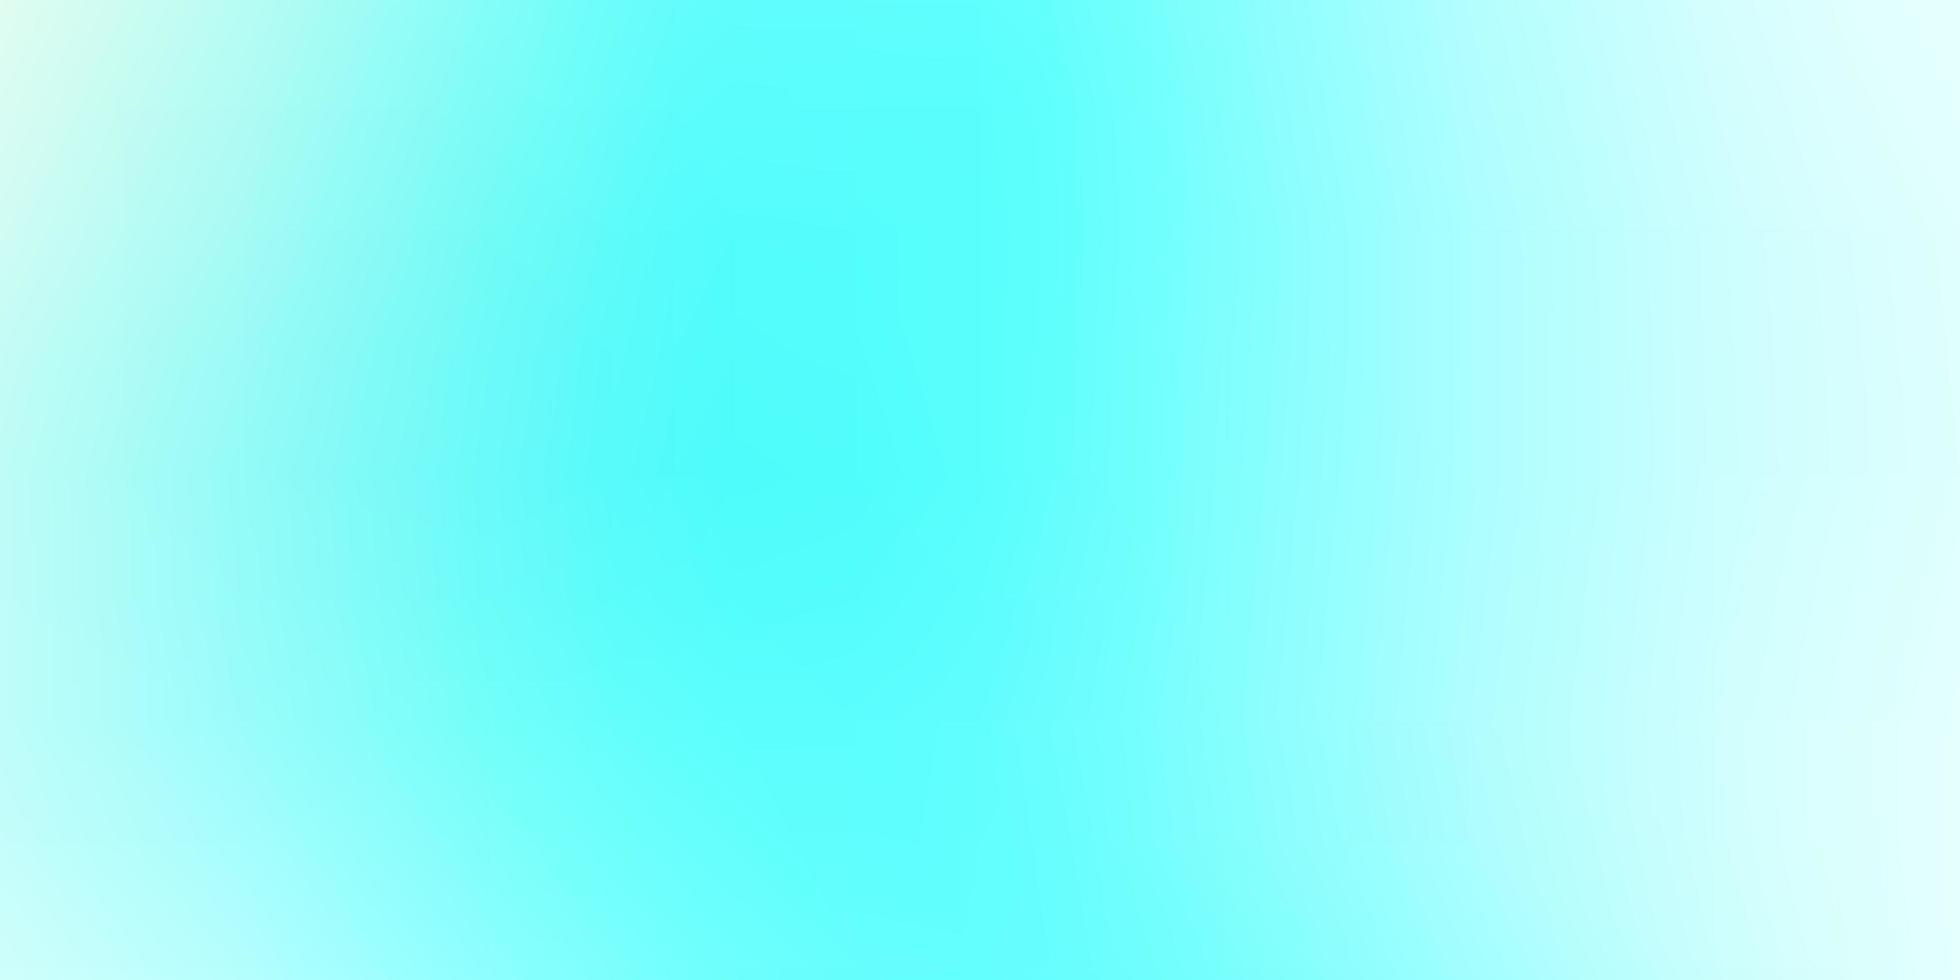 Light Green smart blurred pattern. vector